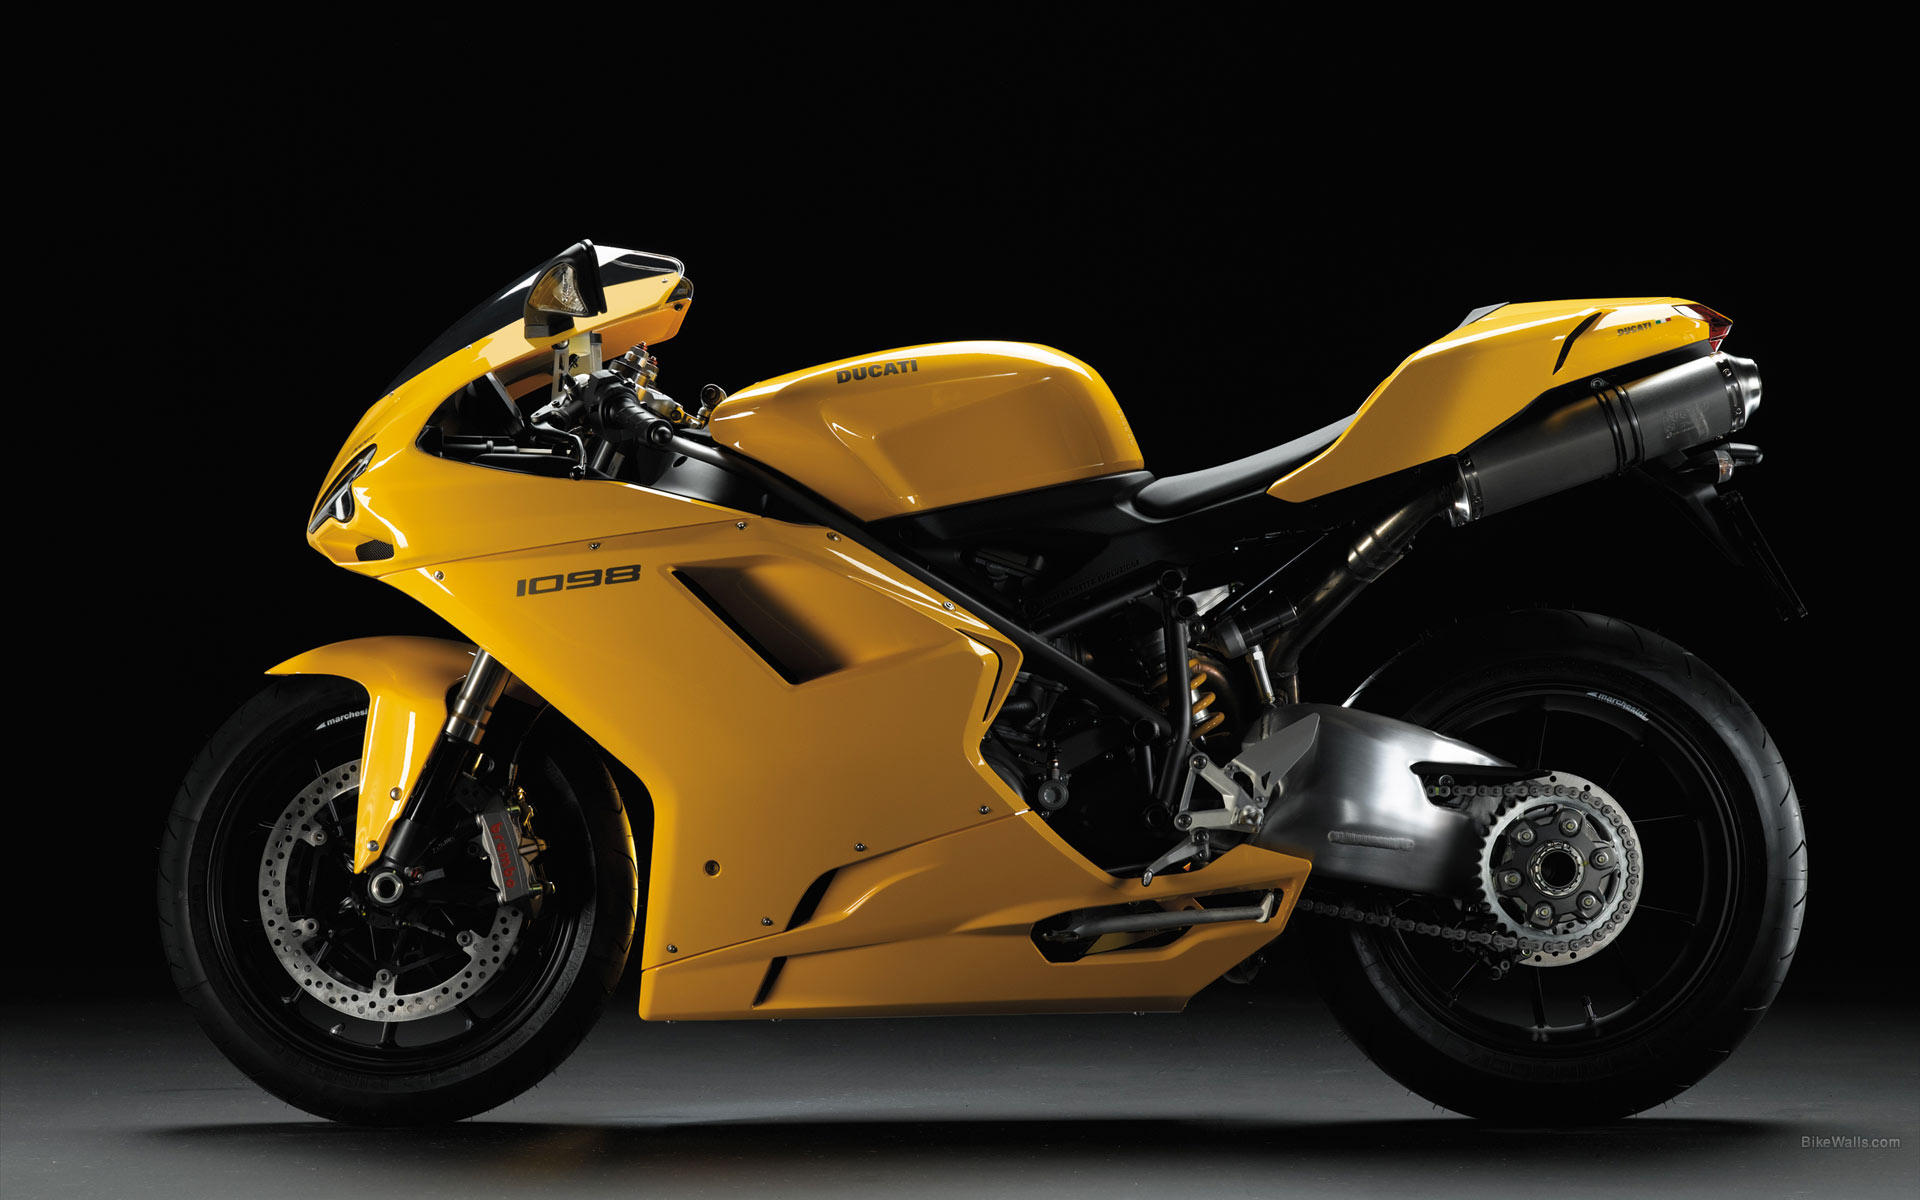 Ducati 1098 17596 Hd Wallpapers in Bikes   Imagescicom 1920x1200